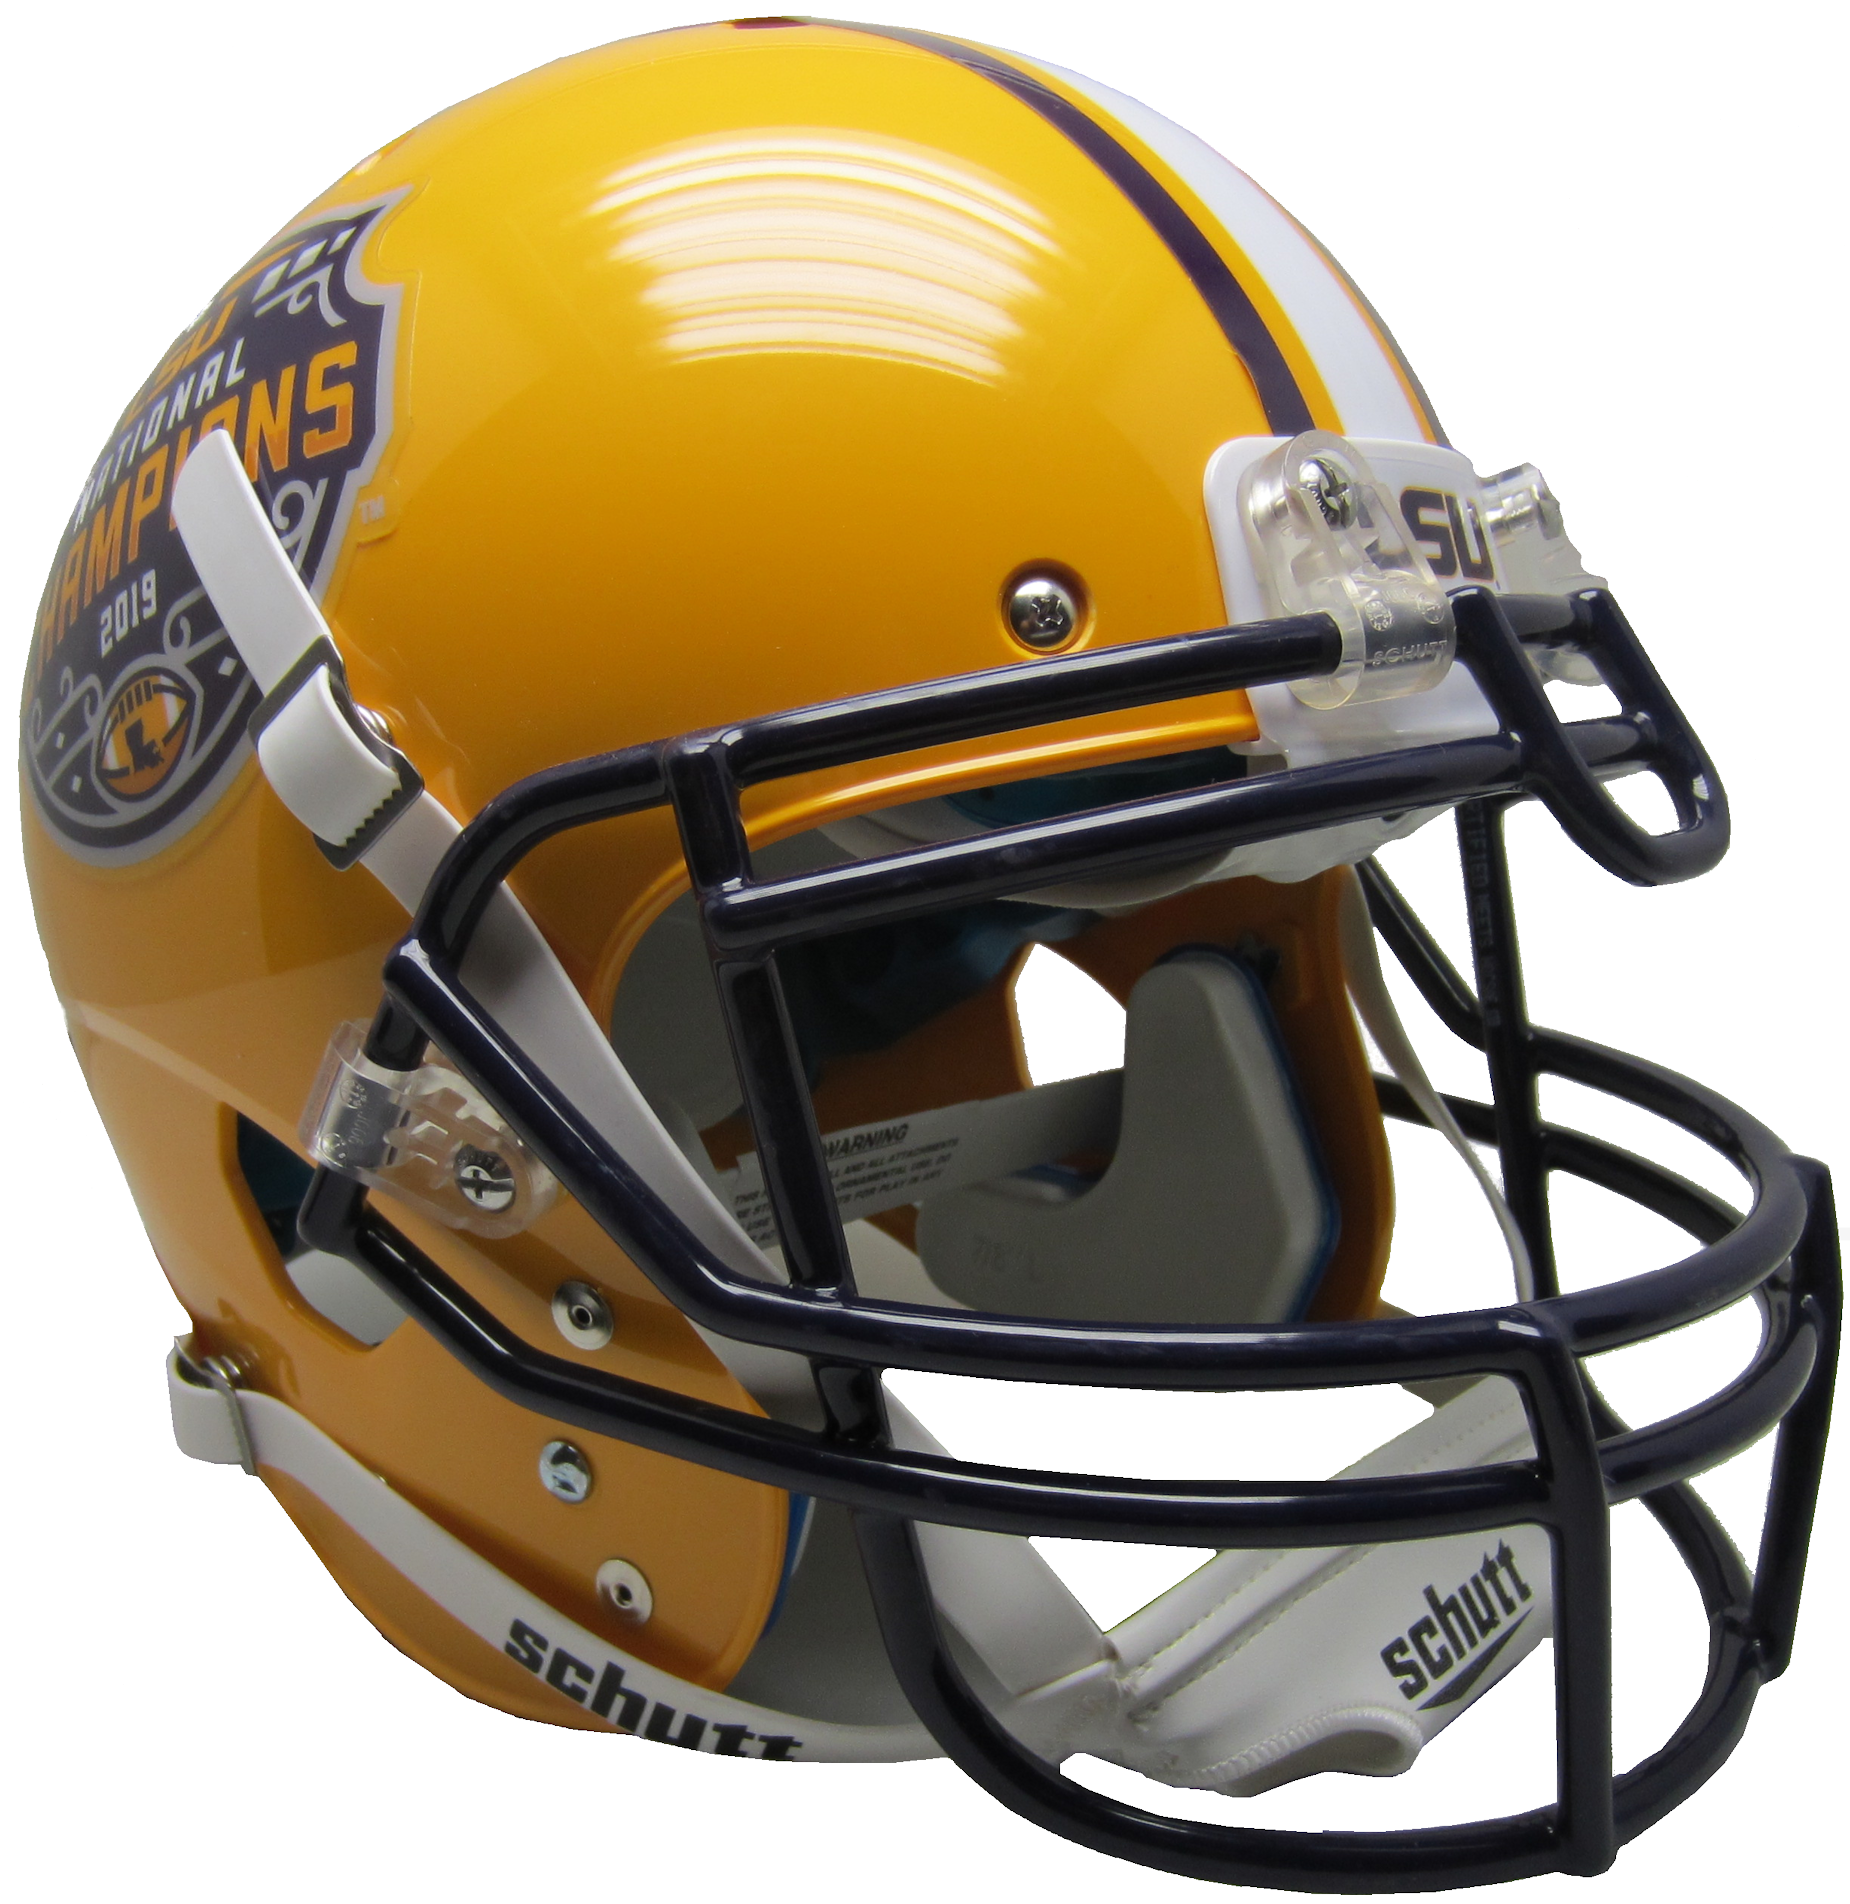 LSU Tigers Authentic College XP Football Helmet Schutt <B>2019 National Champions</B>